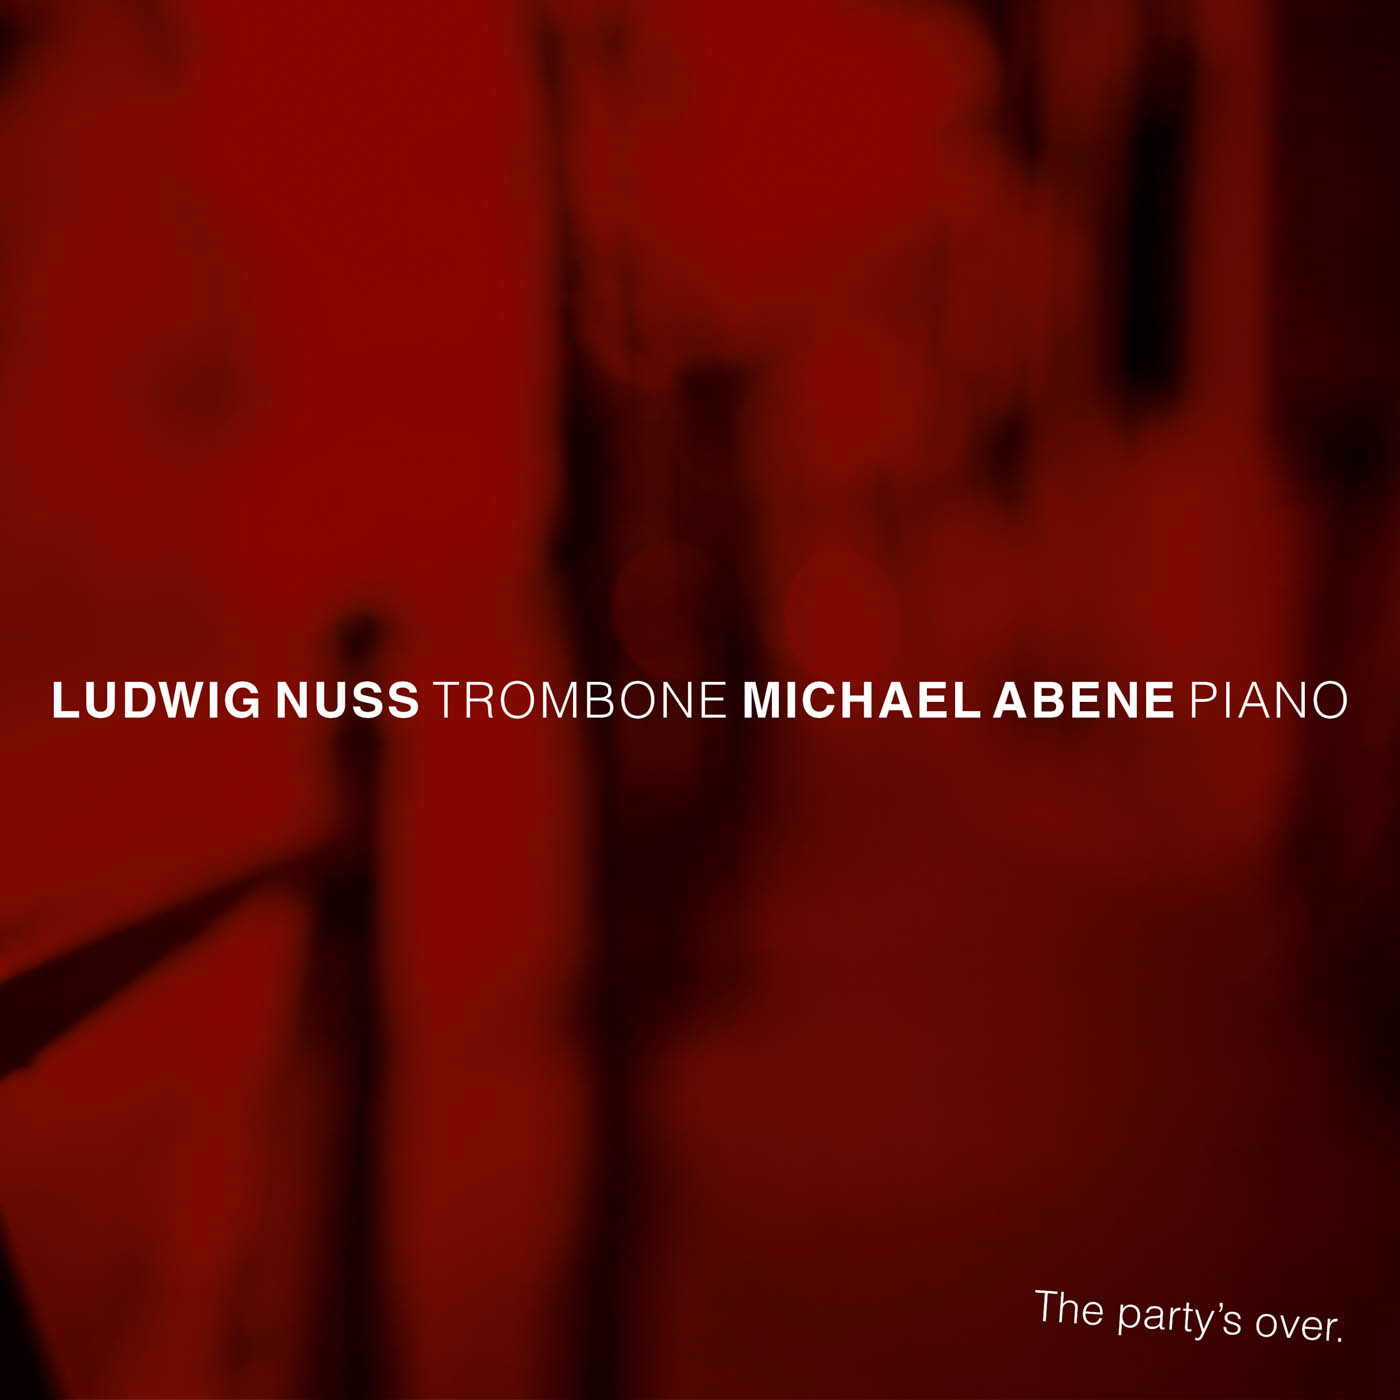 Ludwig-Nuss-Michael-Abene-The-Partys-over-Digitalvertrieb.jpg